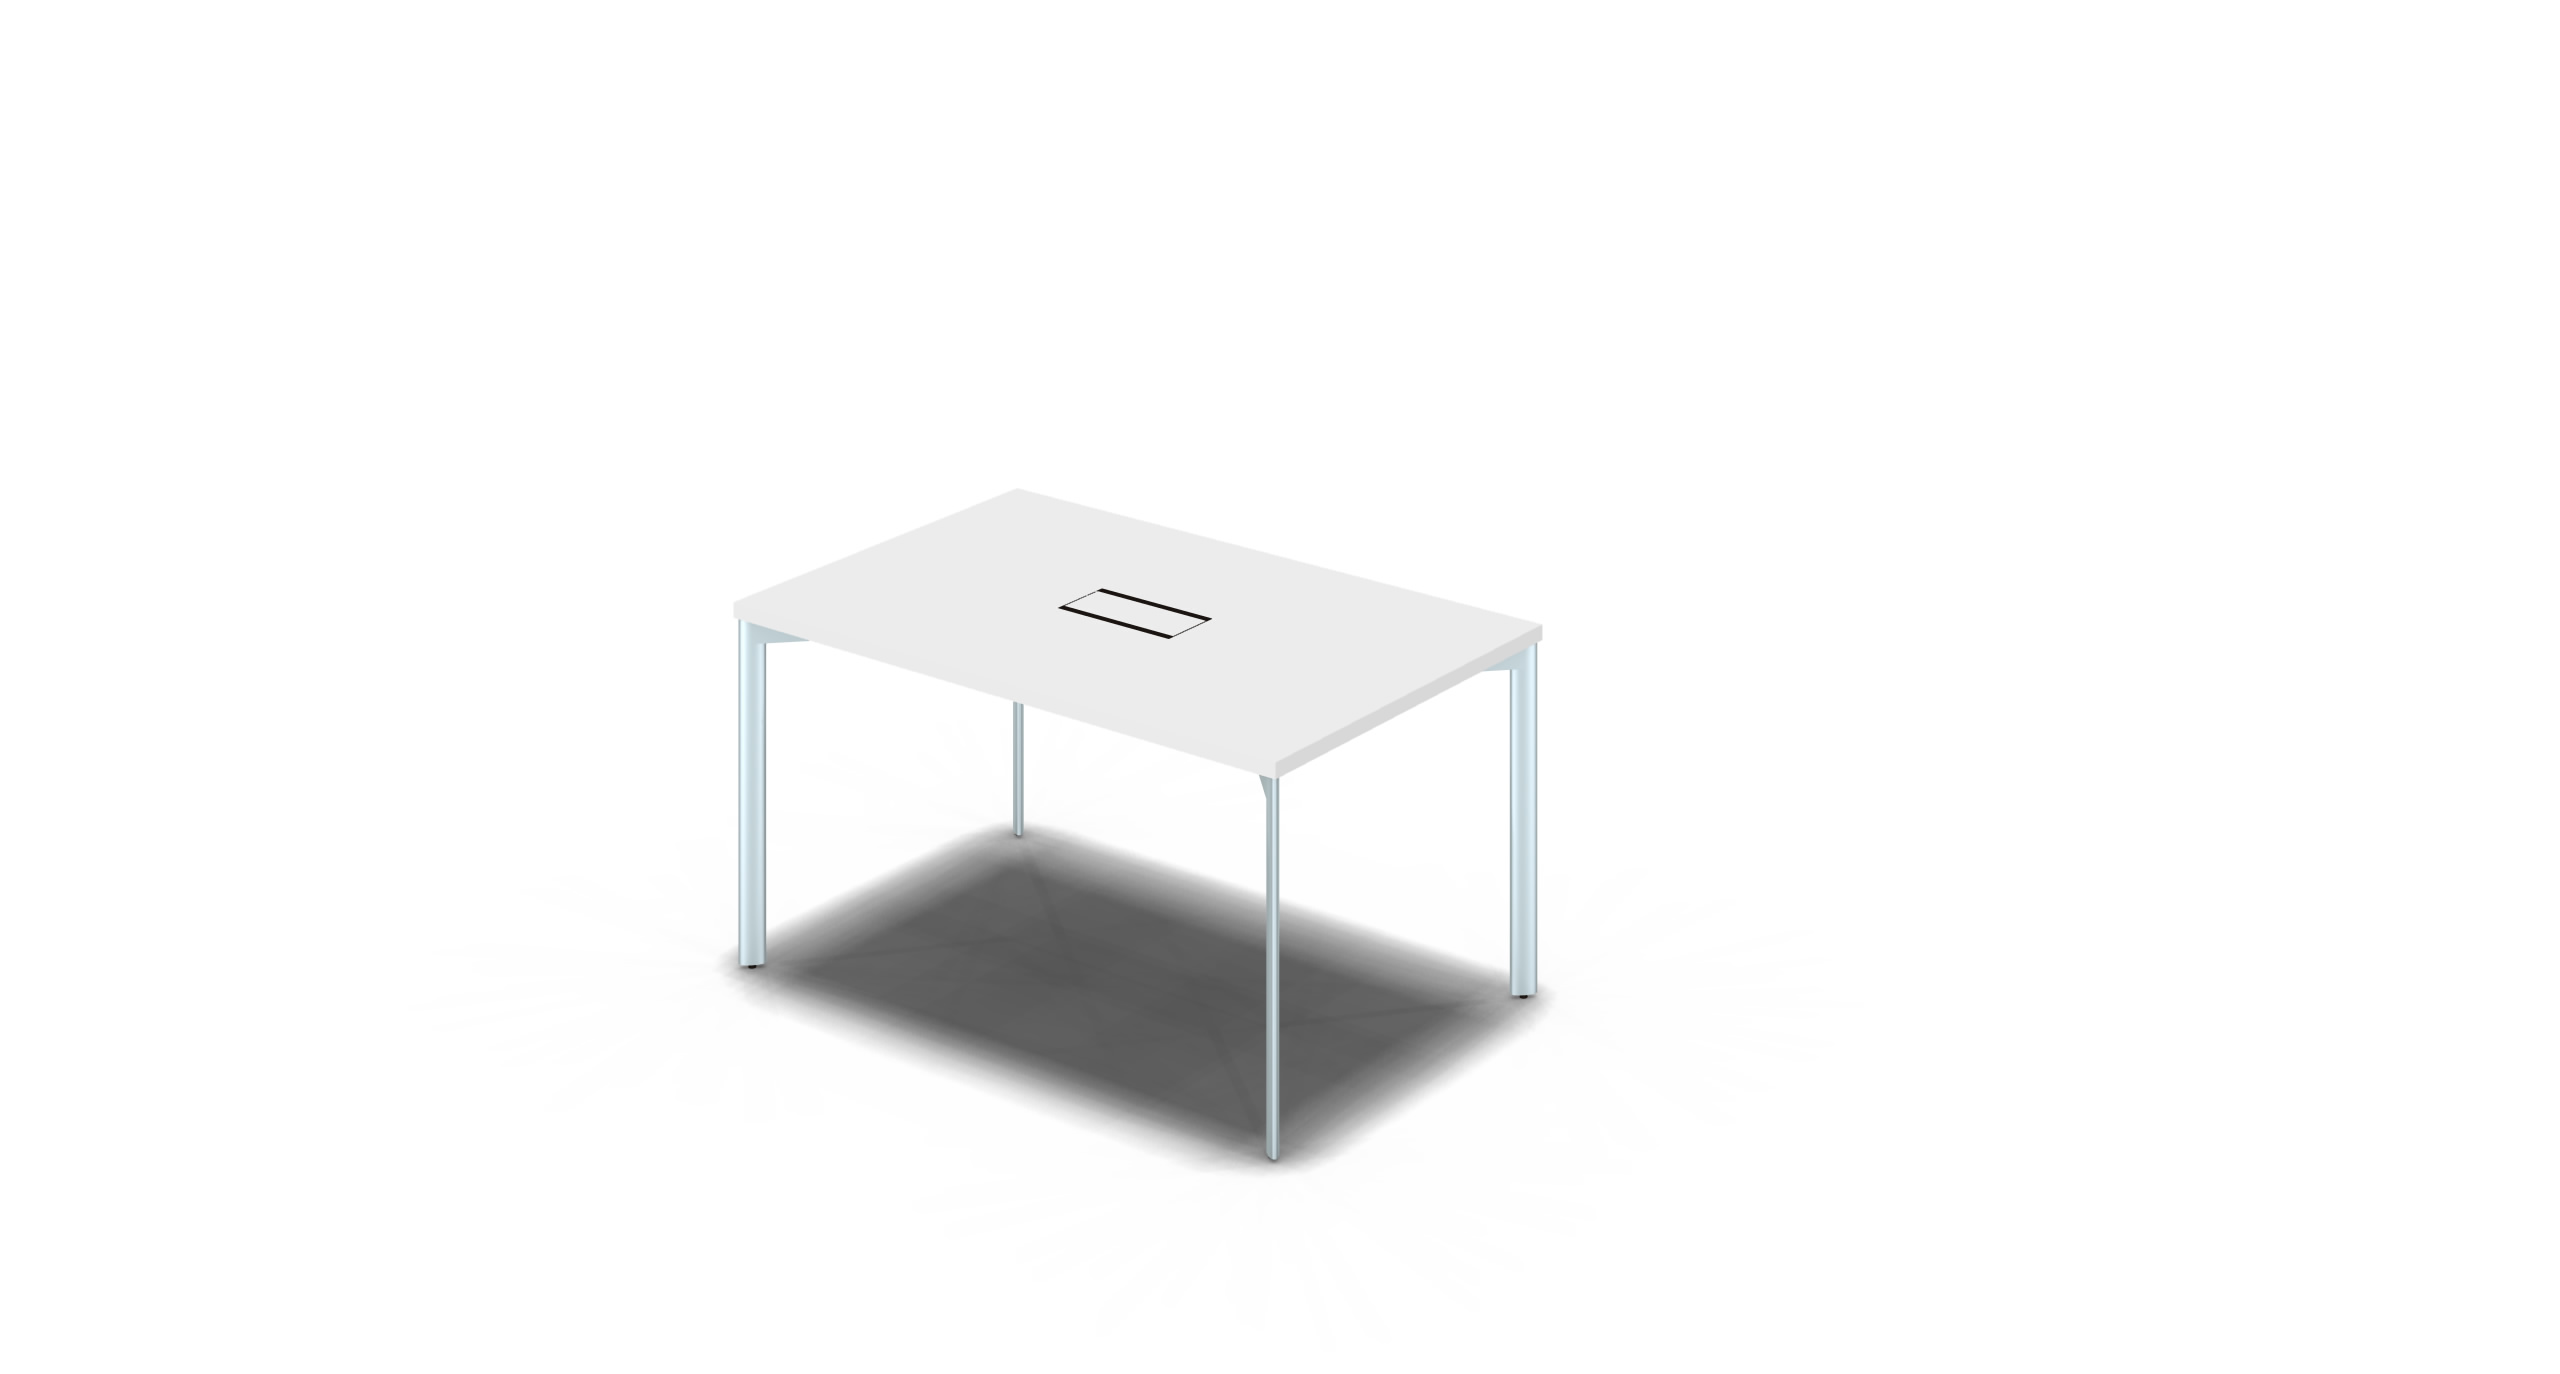 Table_Slim_1200x750_Silver_White_withOption